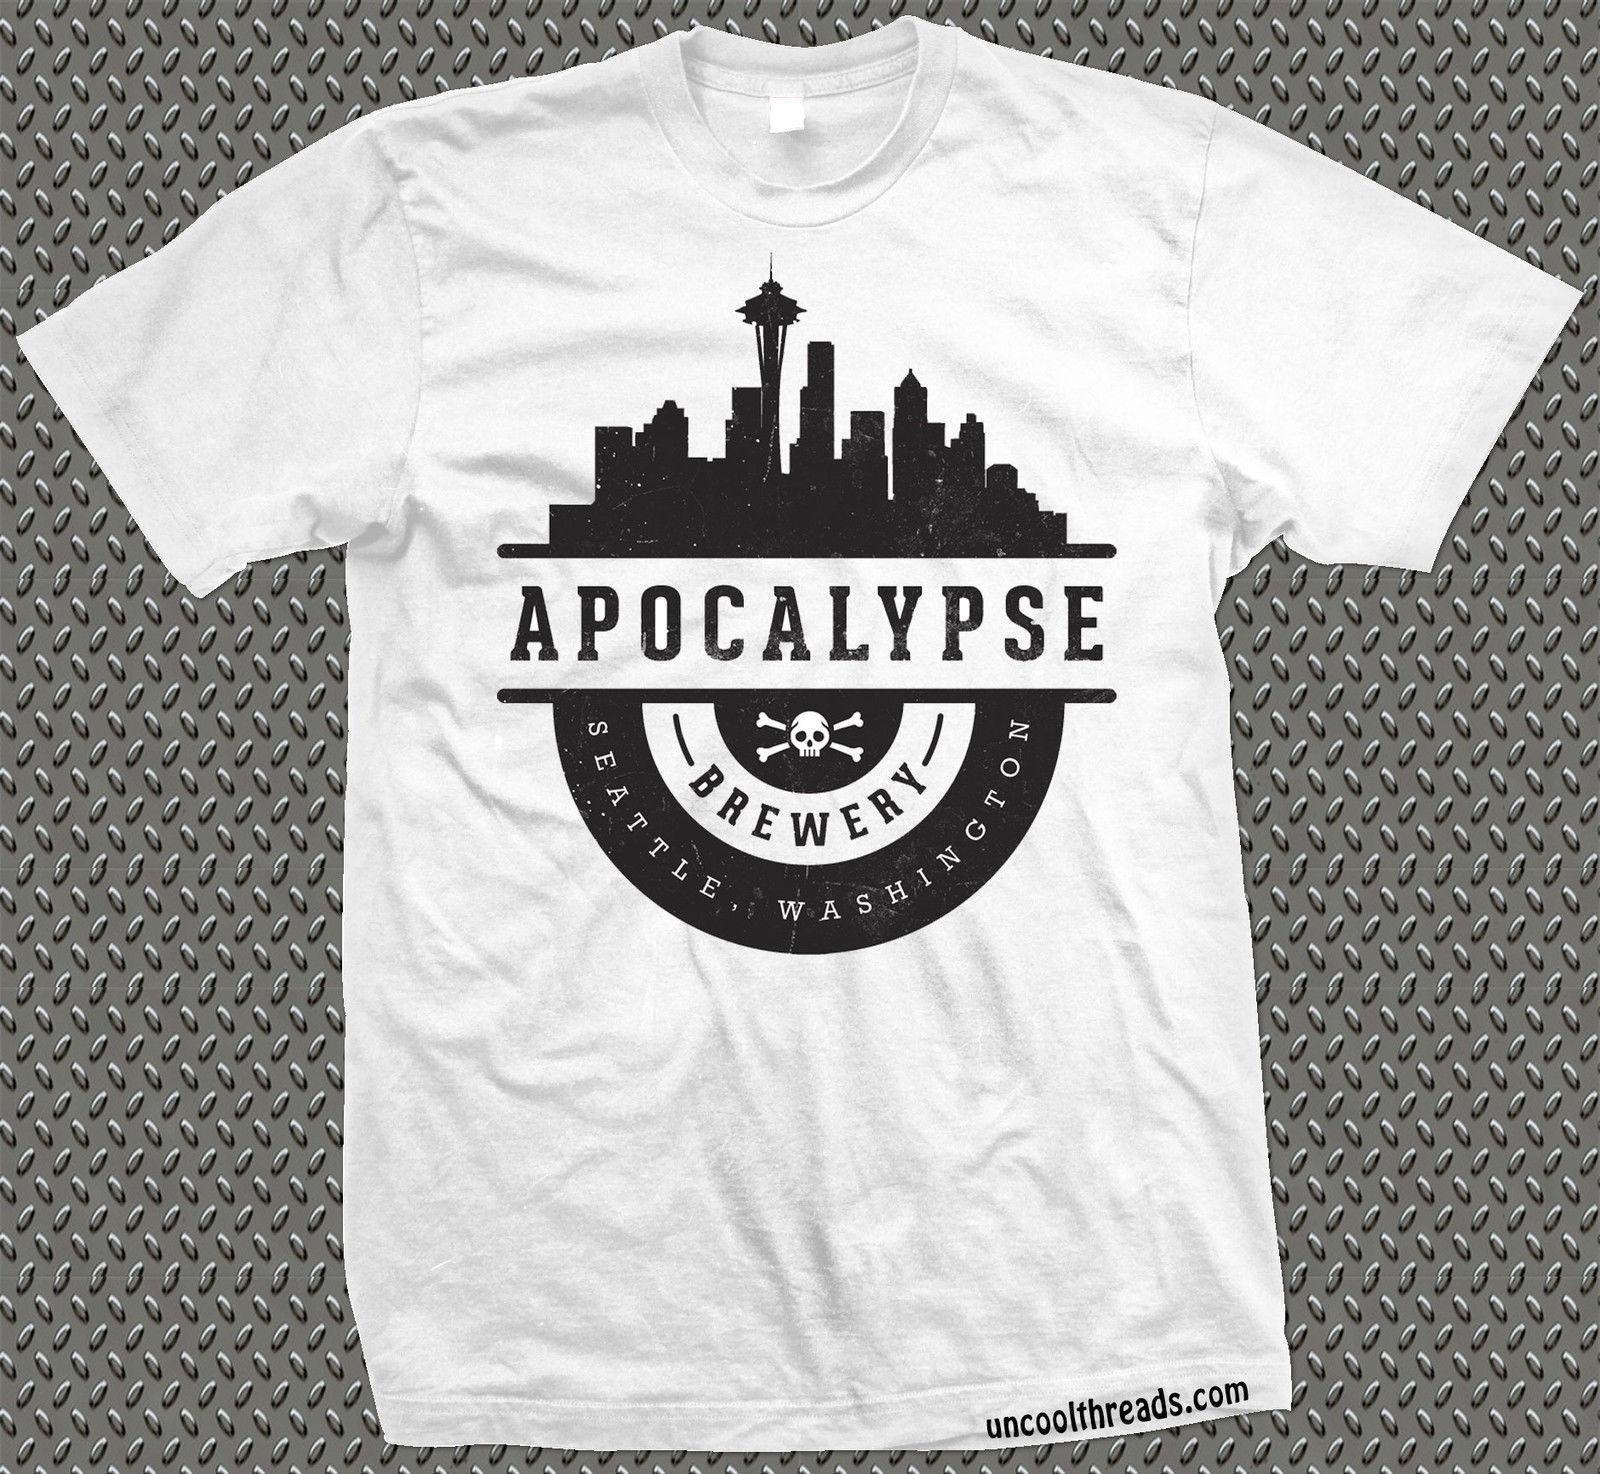 Apocalypse Brewery Washington Brewing Company Beer T Shirt Ascot